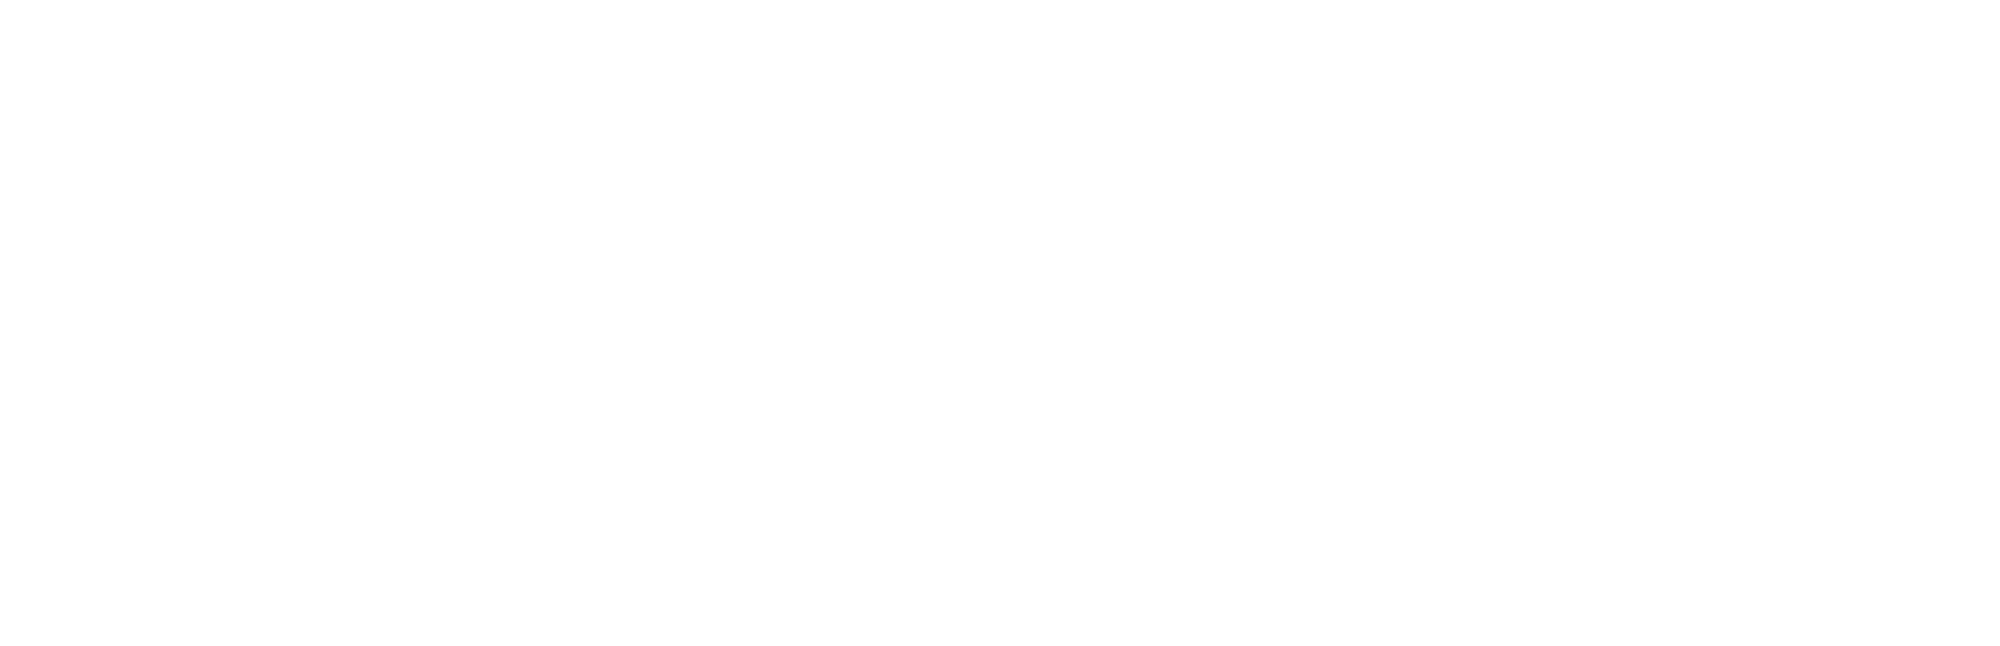 Sonia Liebing bei Soundcloud streamen